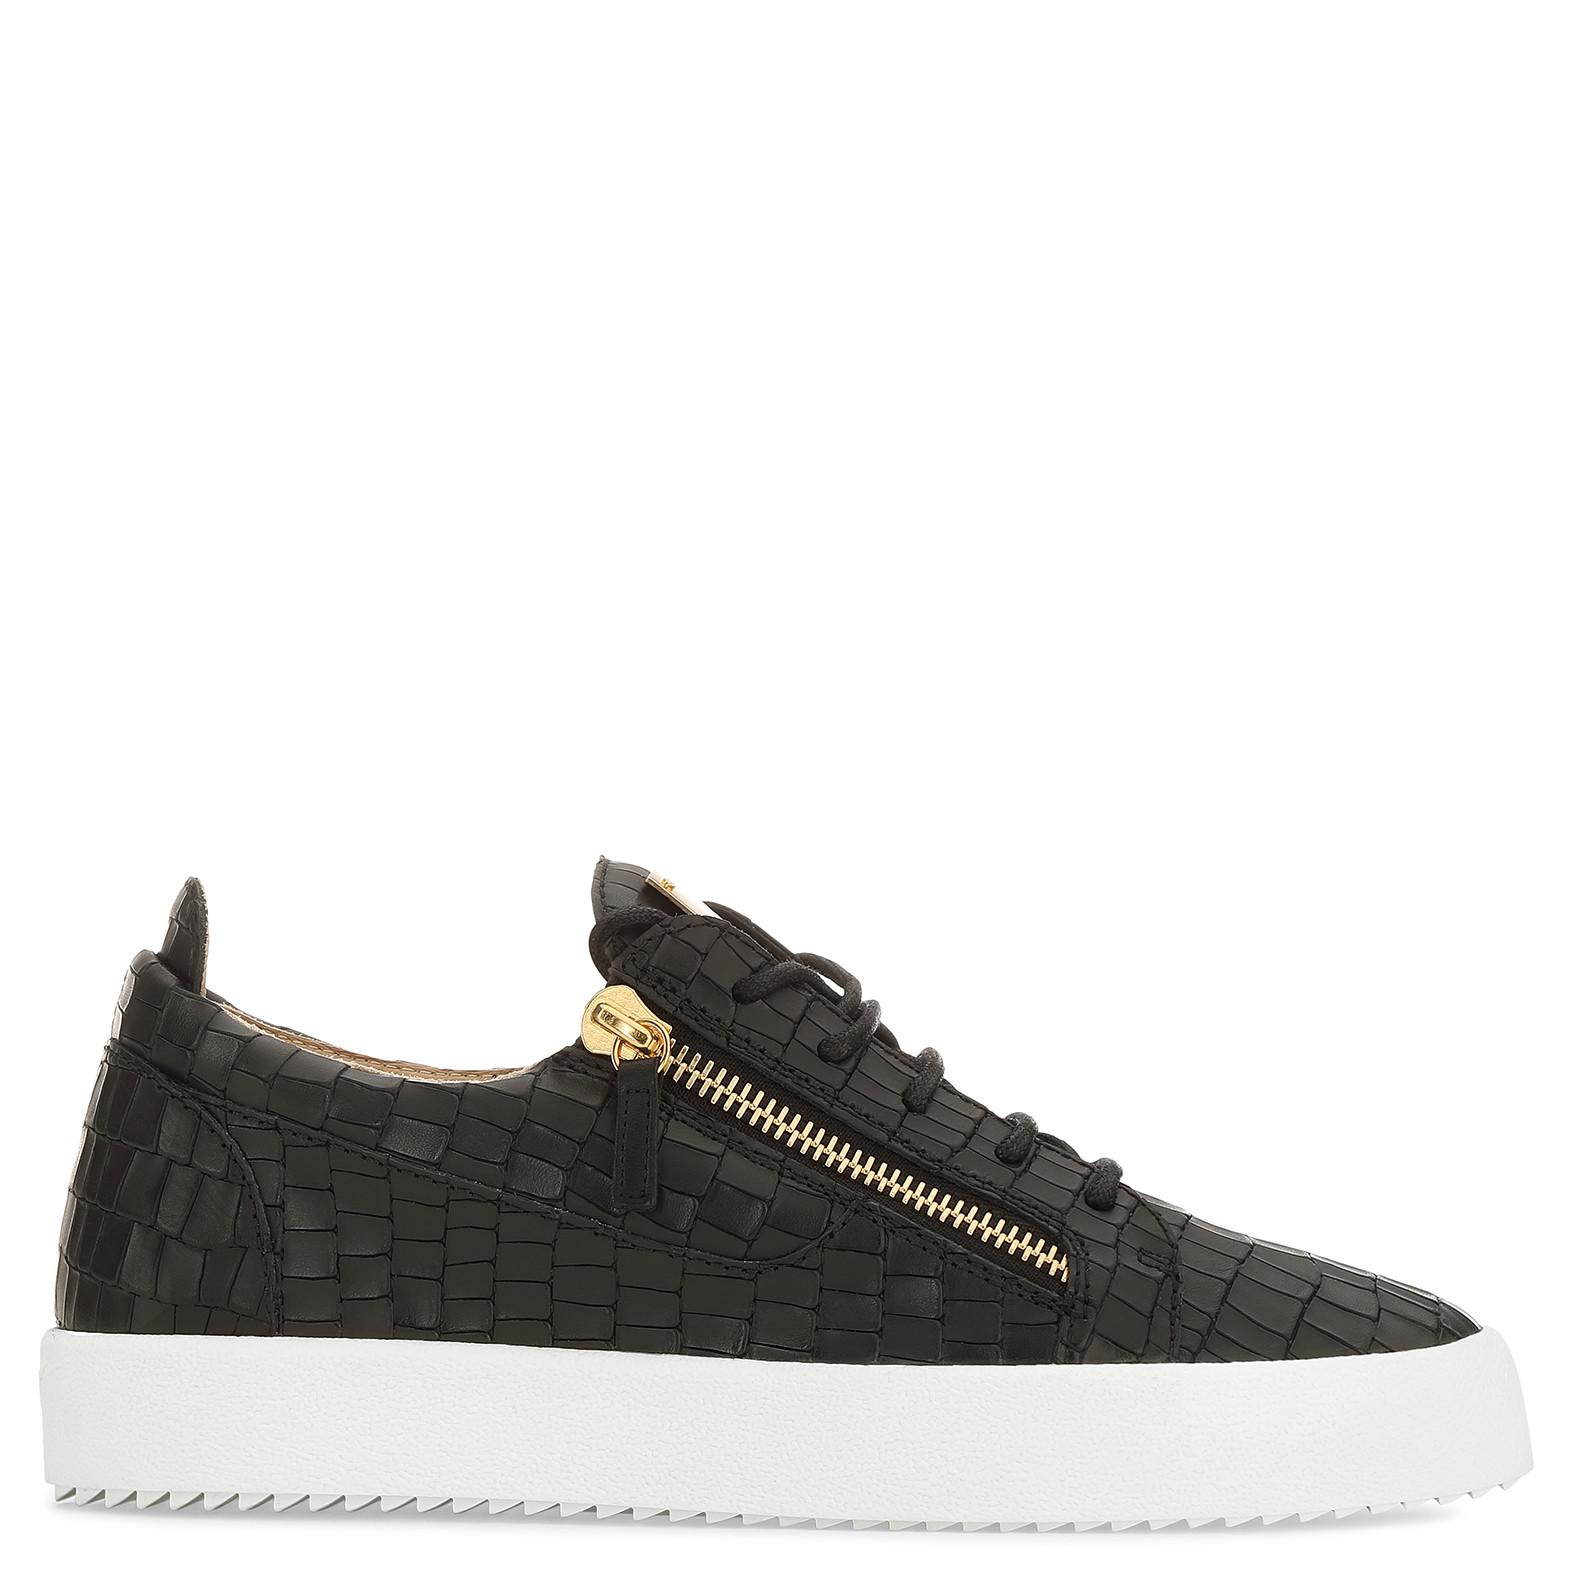 Giuseppe Zanotti Mens Croc-Embossed Low-Top Sneakers, Black